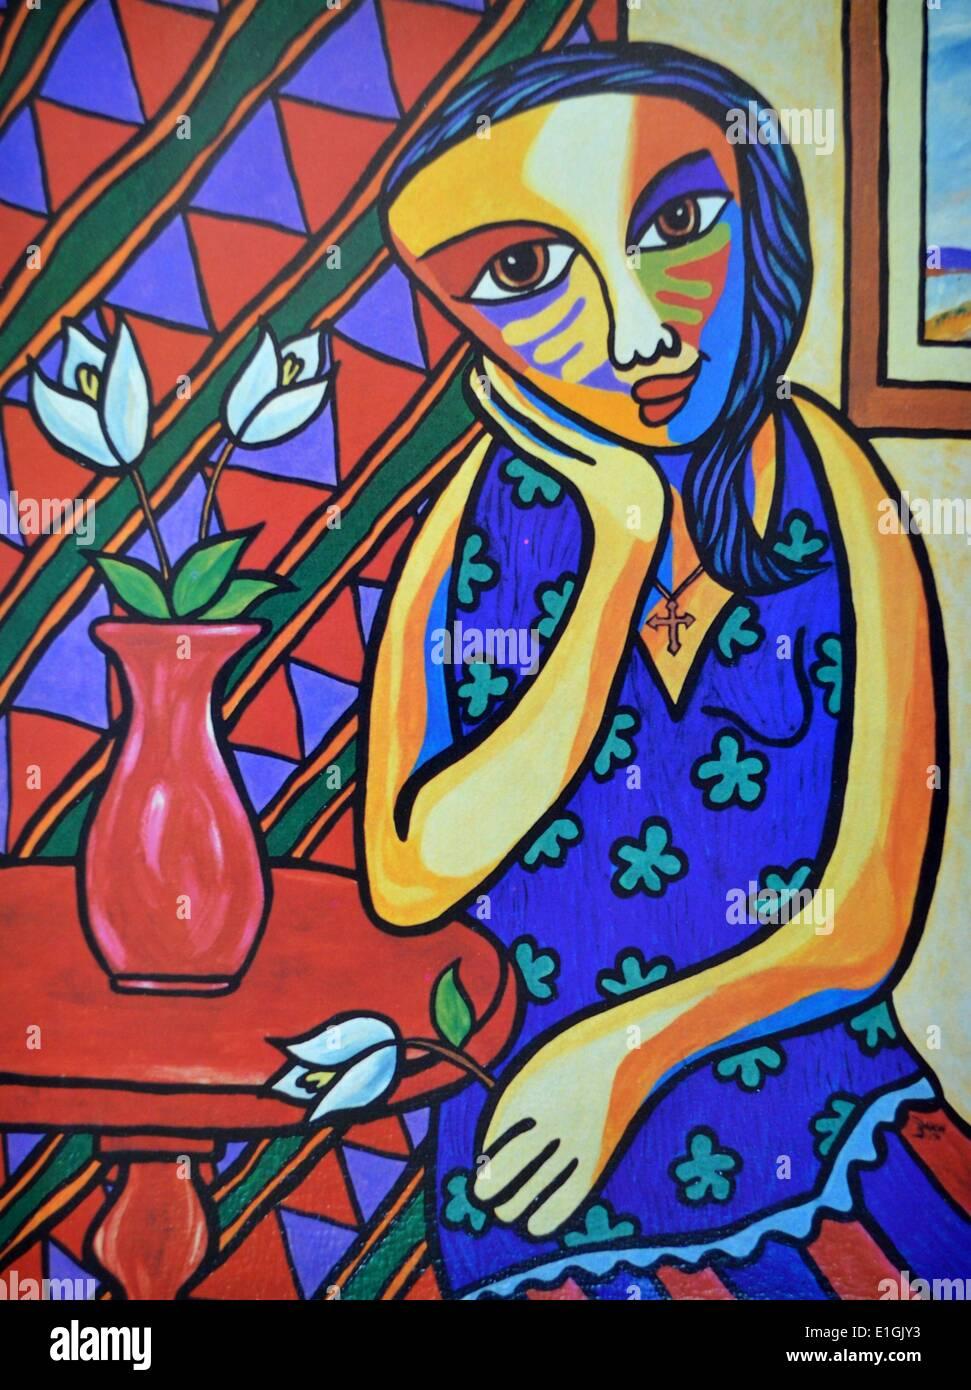 Philipp Badon, Blooming Lady, 1994. Acrylic on canvas. - Stock Image